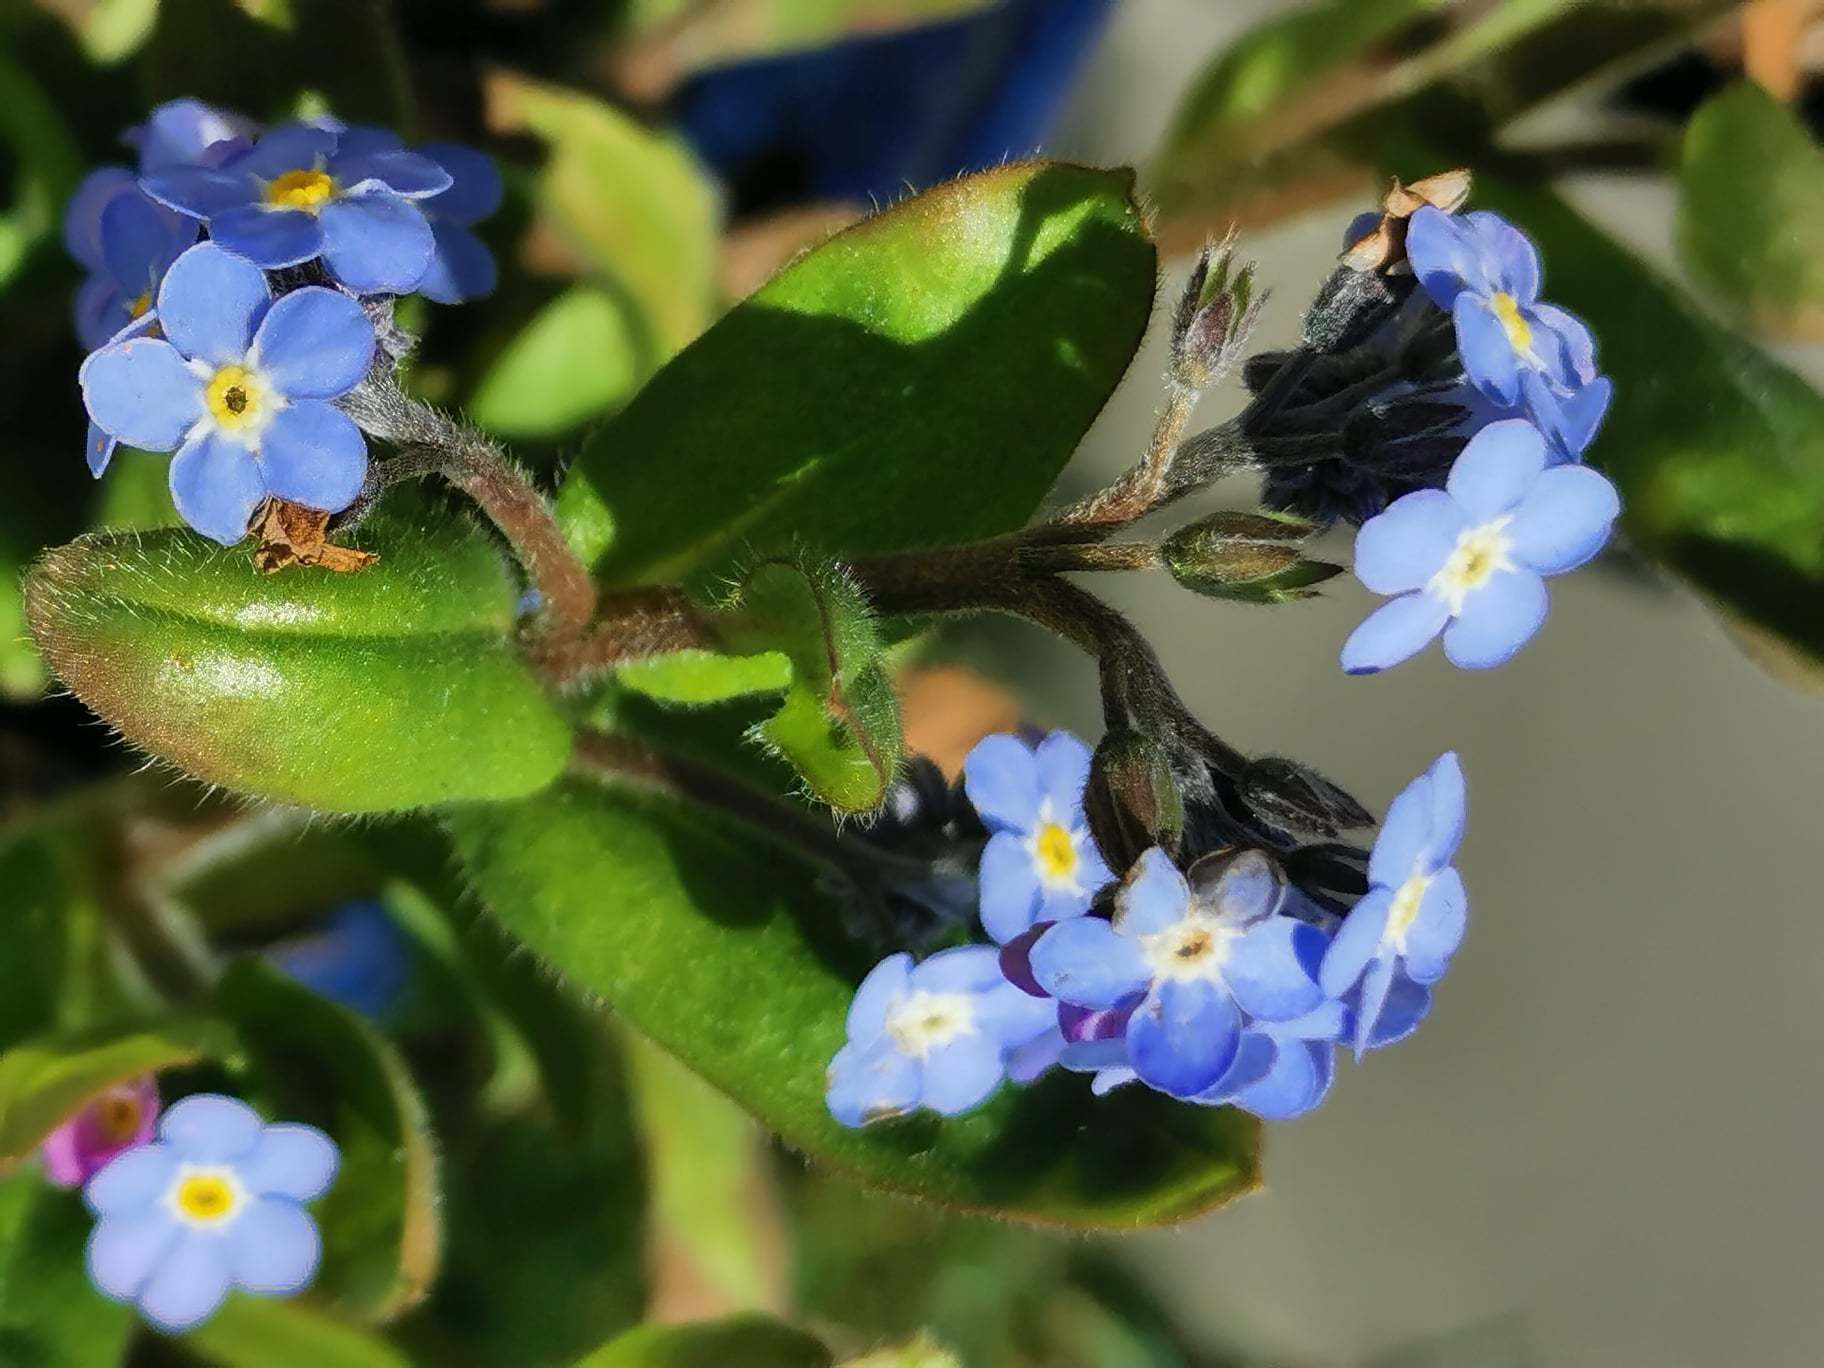 Spring has sprung, by Tina Richards